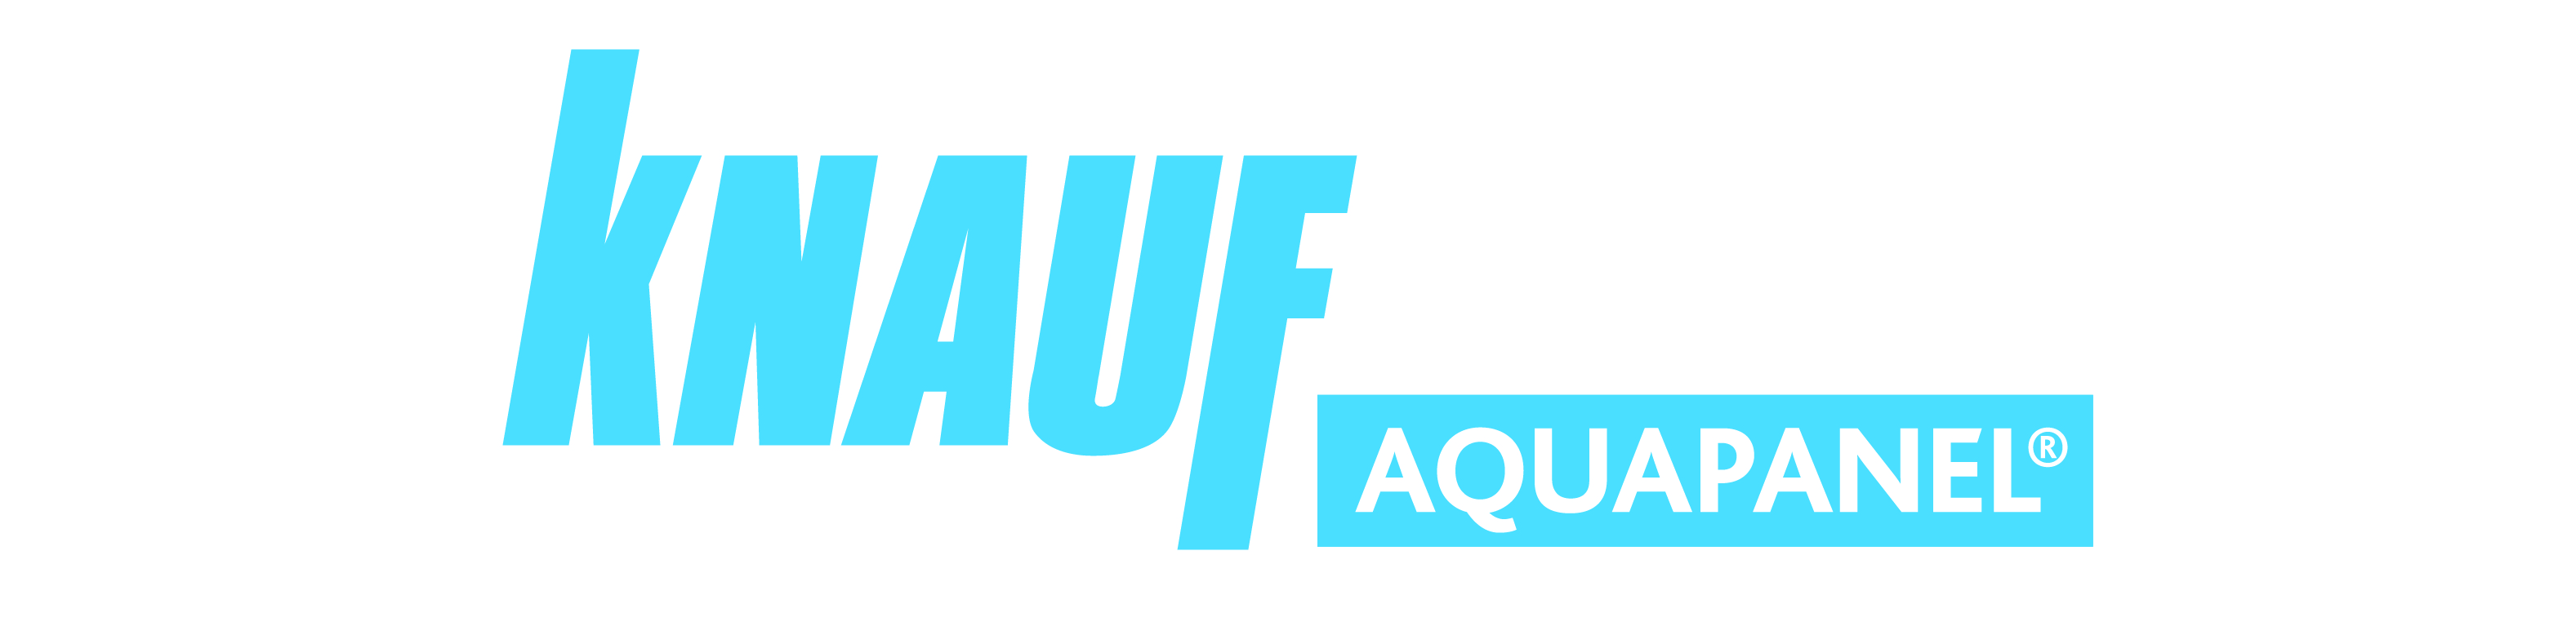 logotipo aquapanel knauf indoor